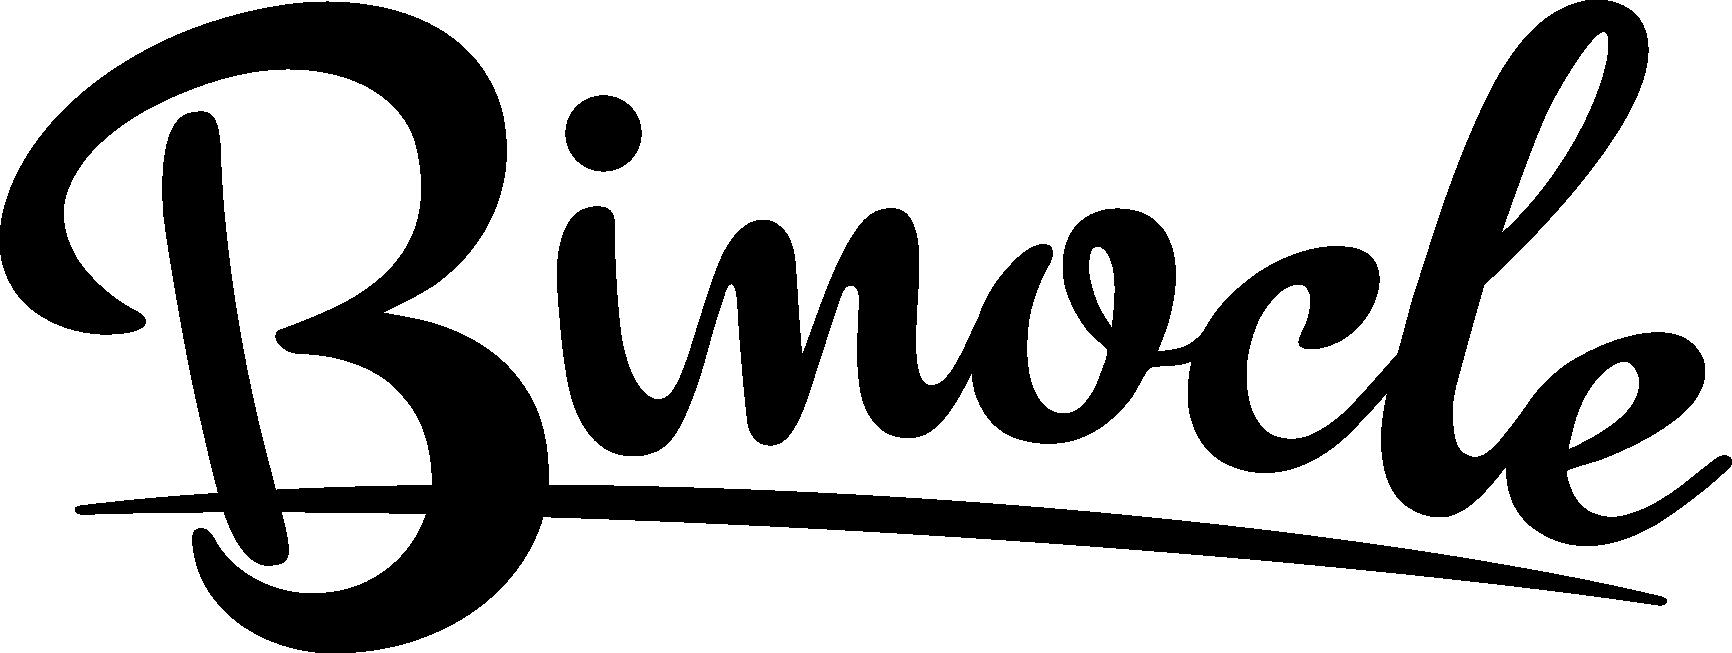 Logo Binocle